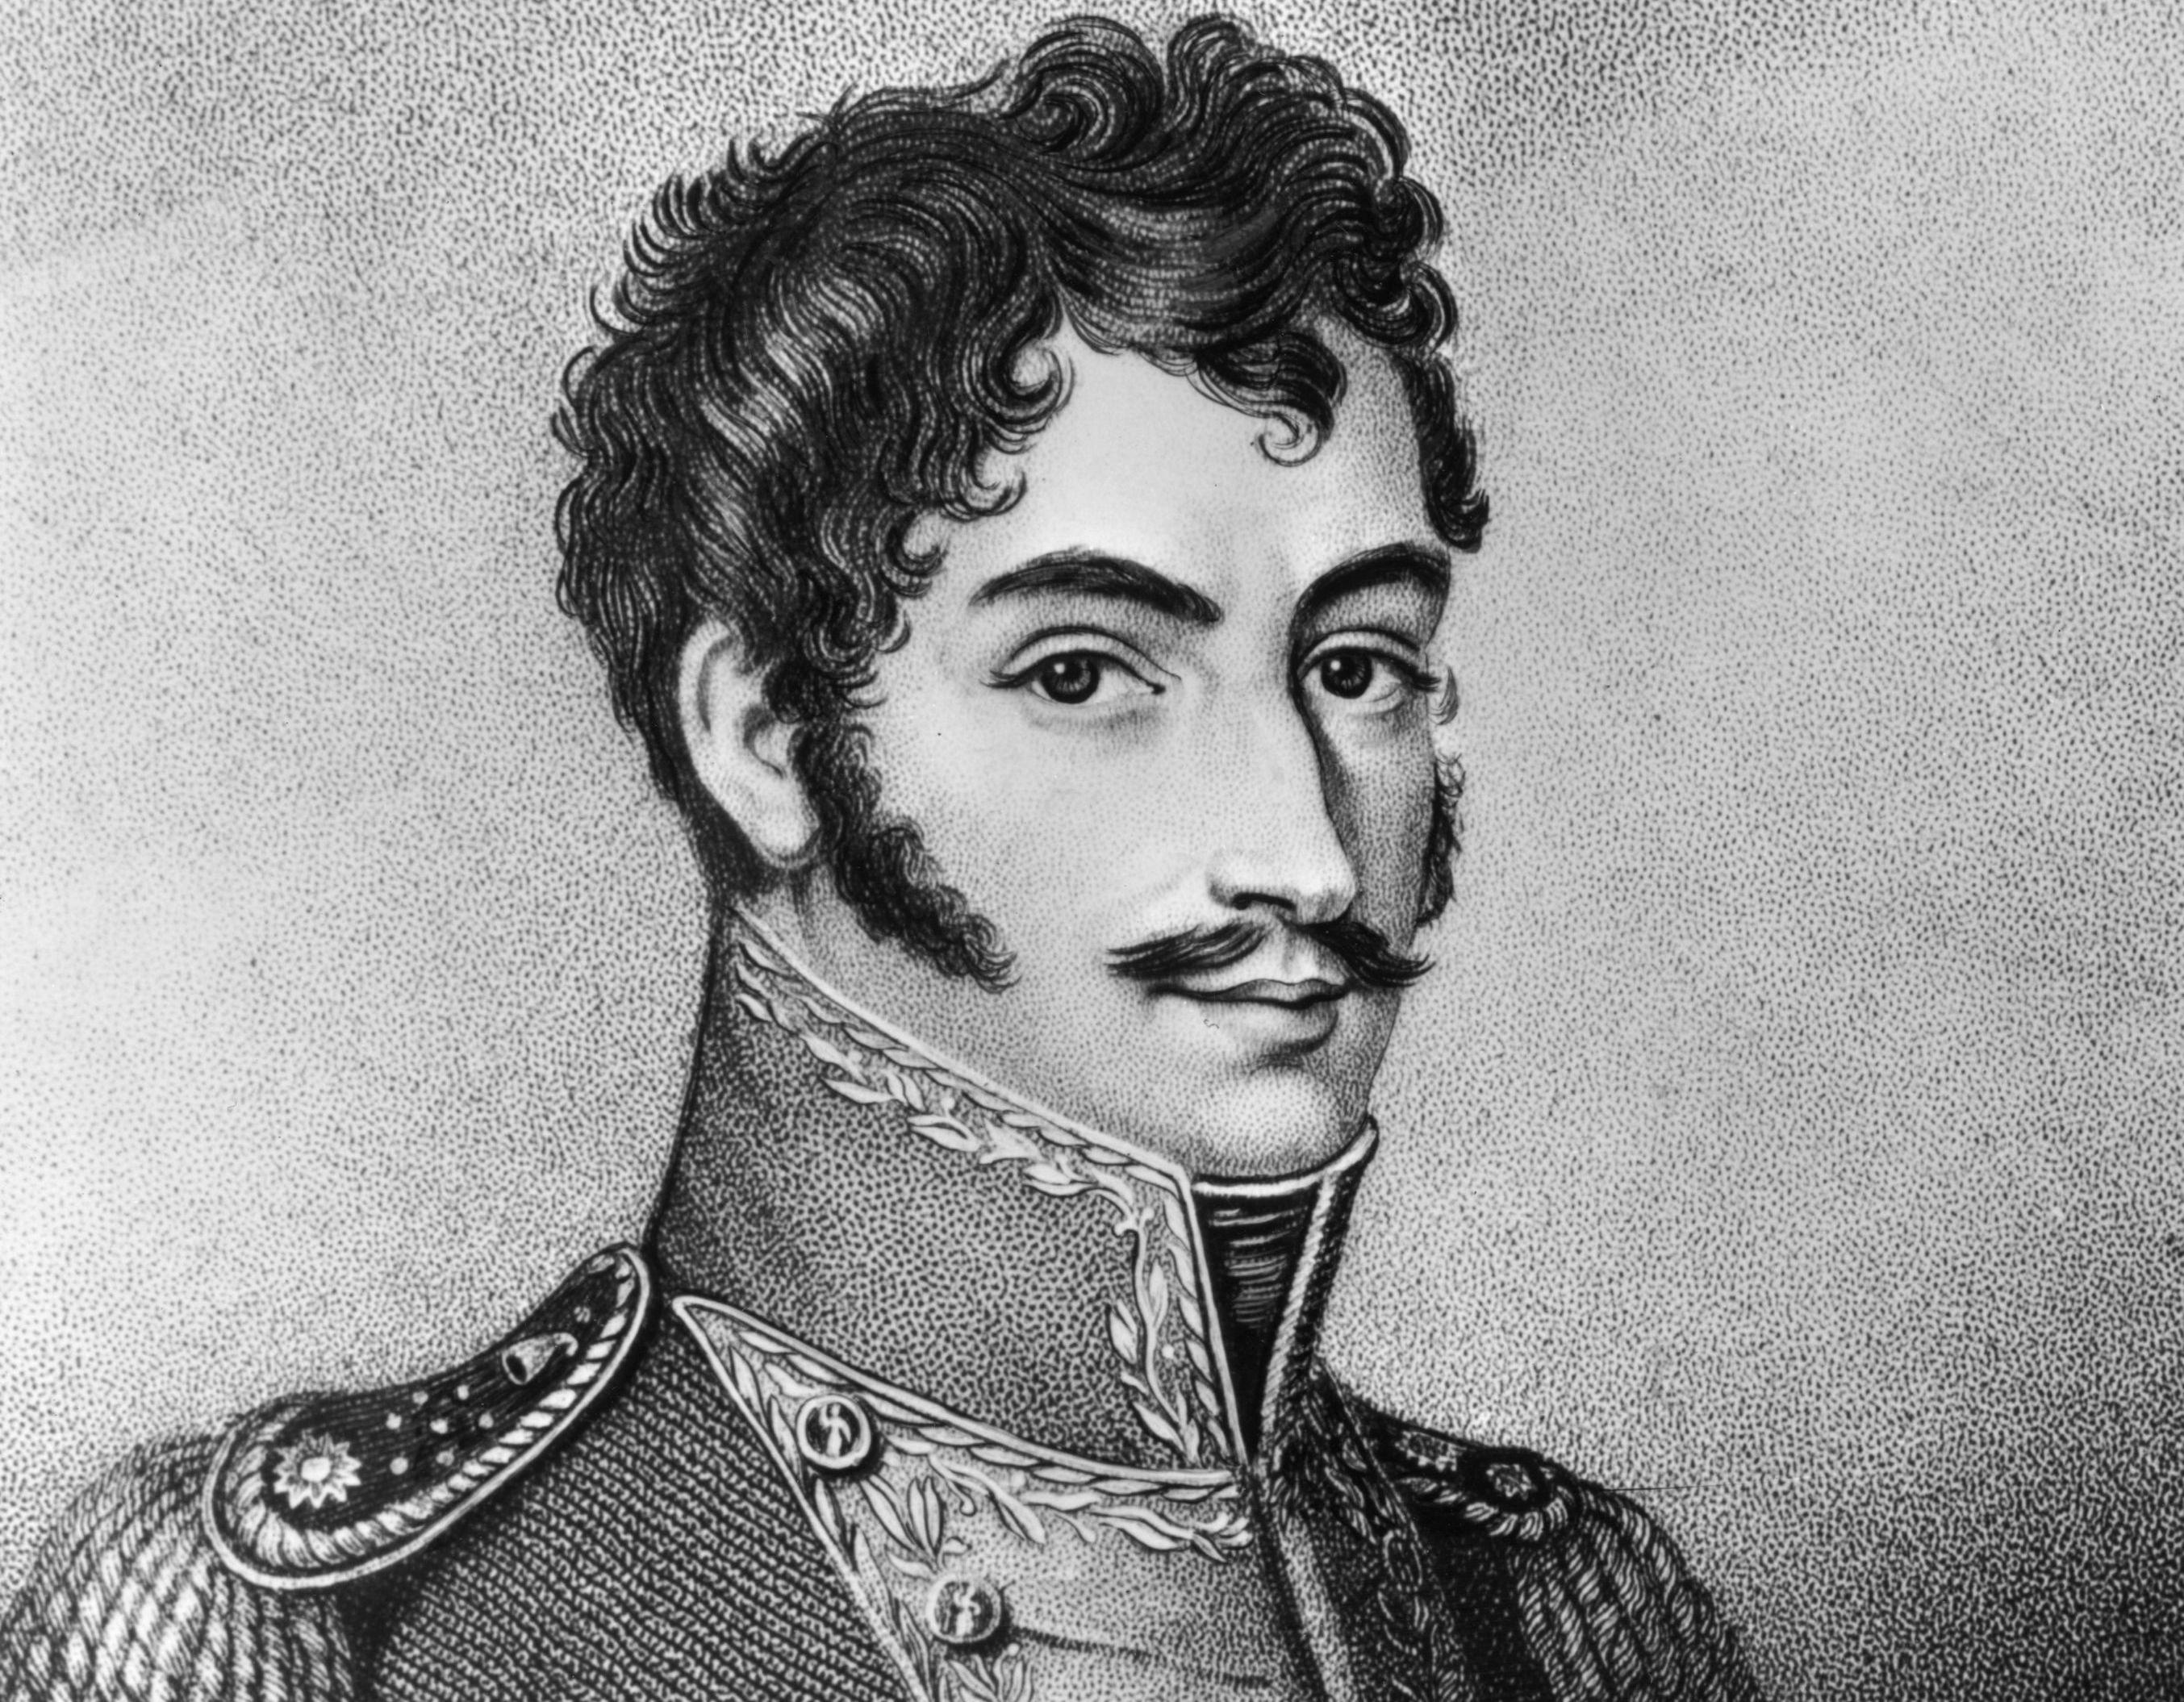 South American revolutionary leader Simon Bolivar